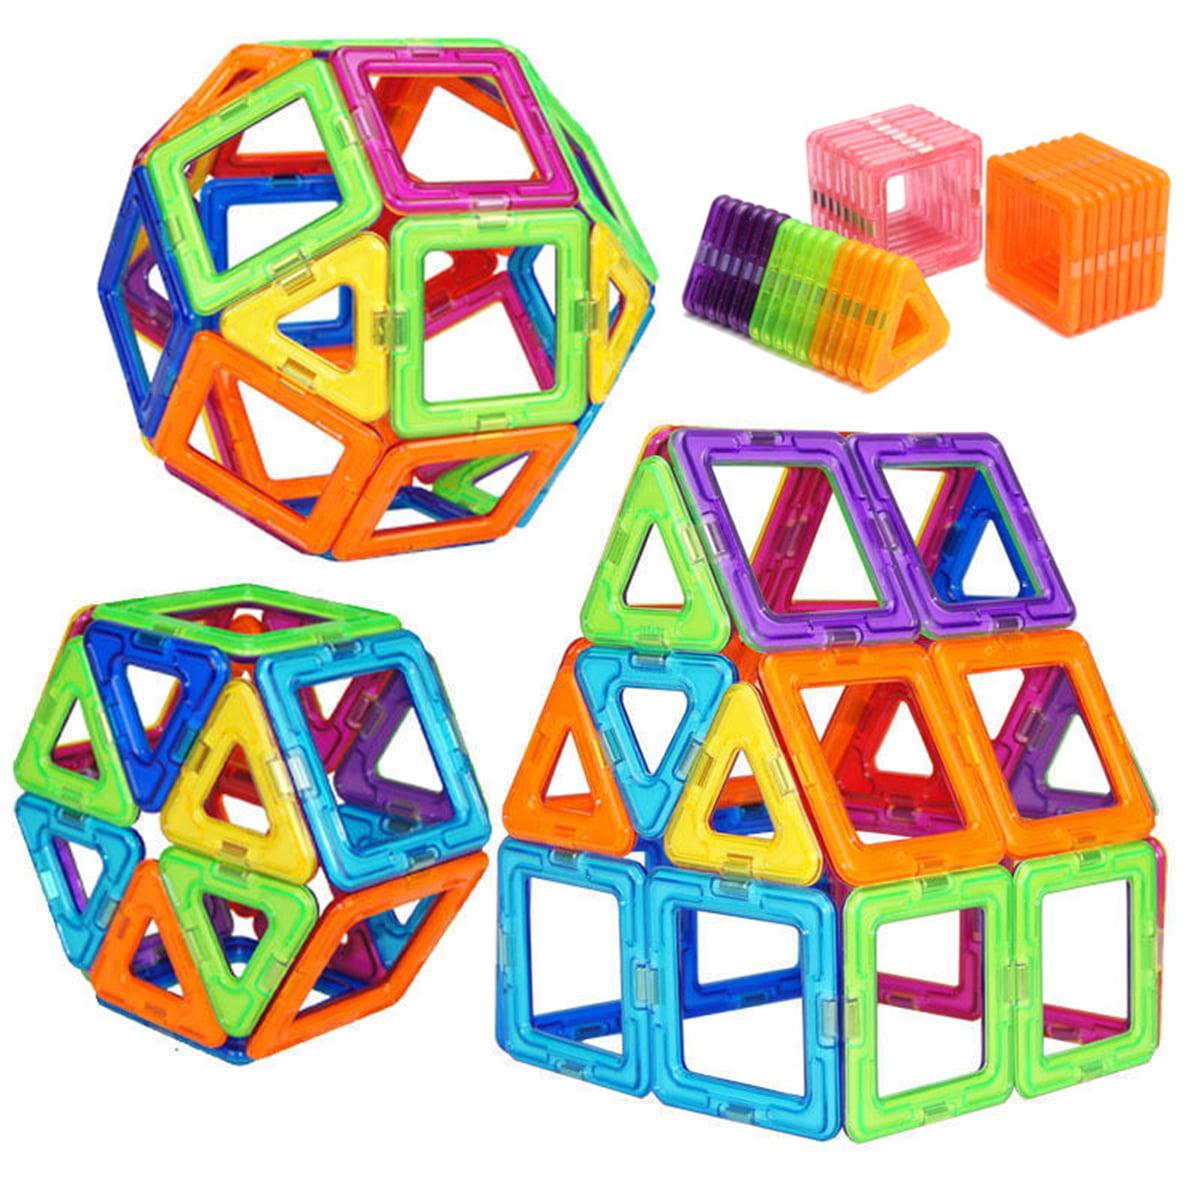 32 Piece Magnetic Bricks Building Blocks Tiles Kids Children Educational Toy Set by